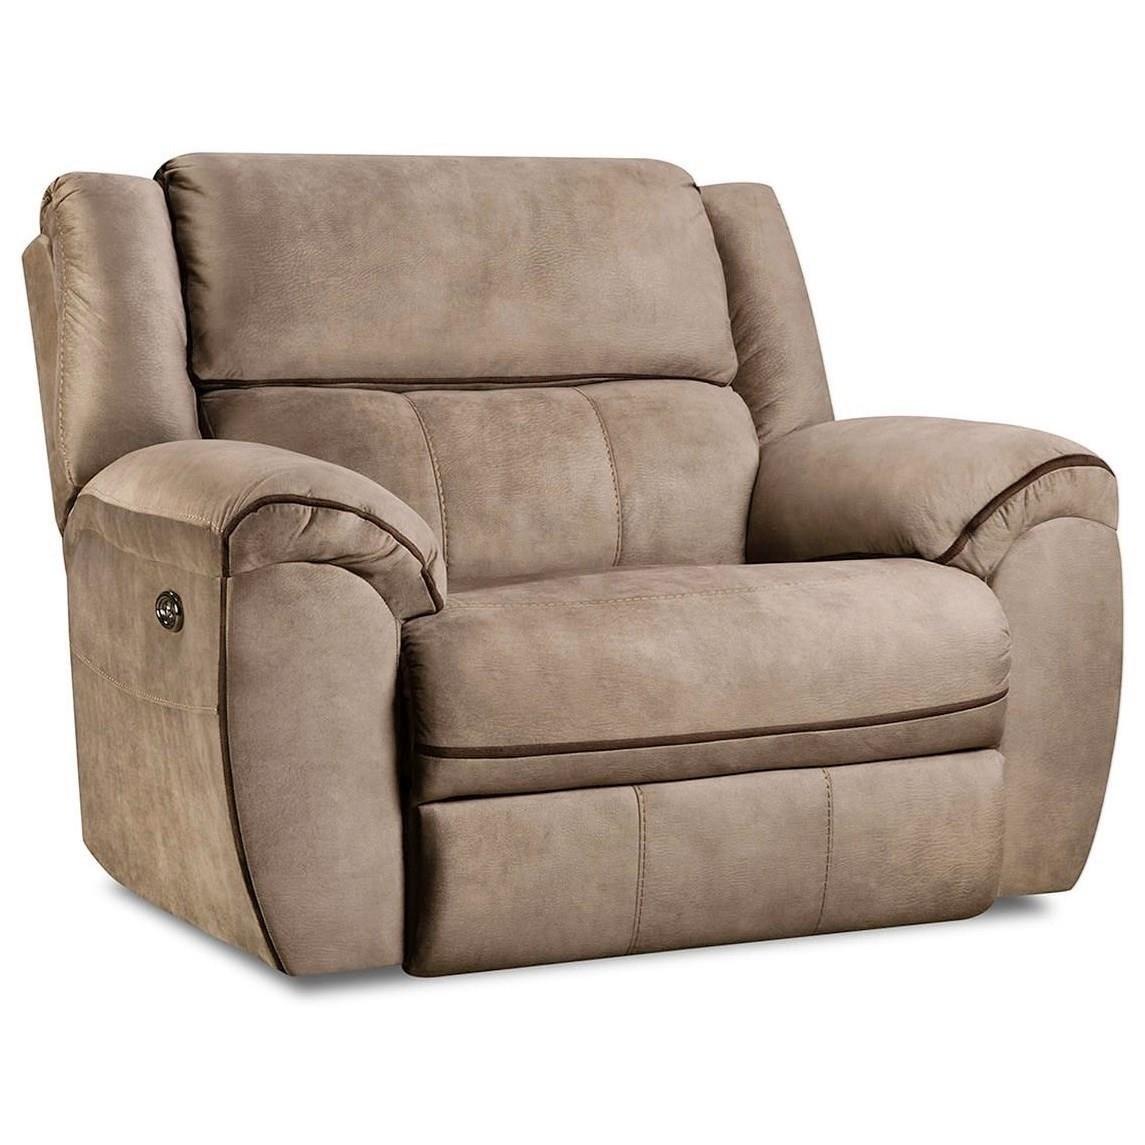 50436BR Power Cuddler Recliner by United Furniture Industries at Bullard Furniture